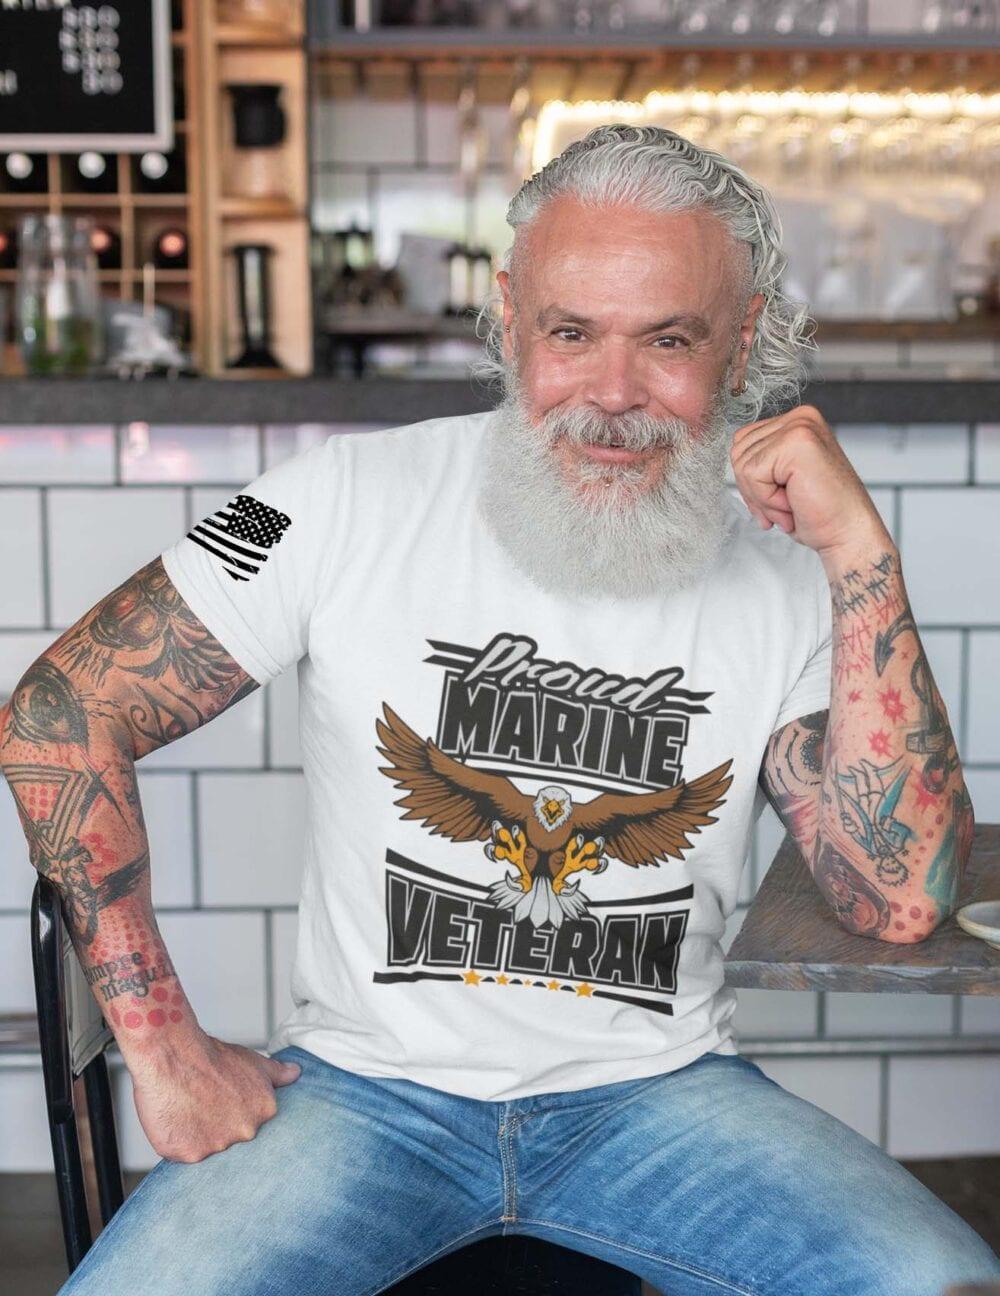 Marine Veteran on Men's White Tshirt